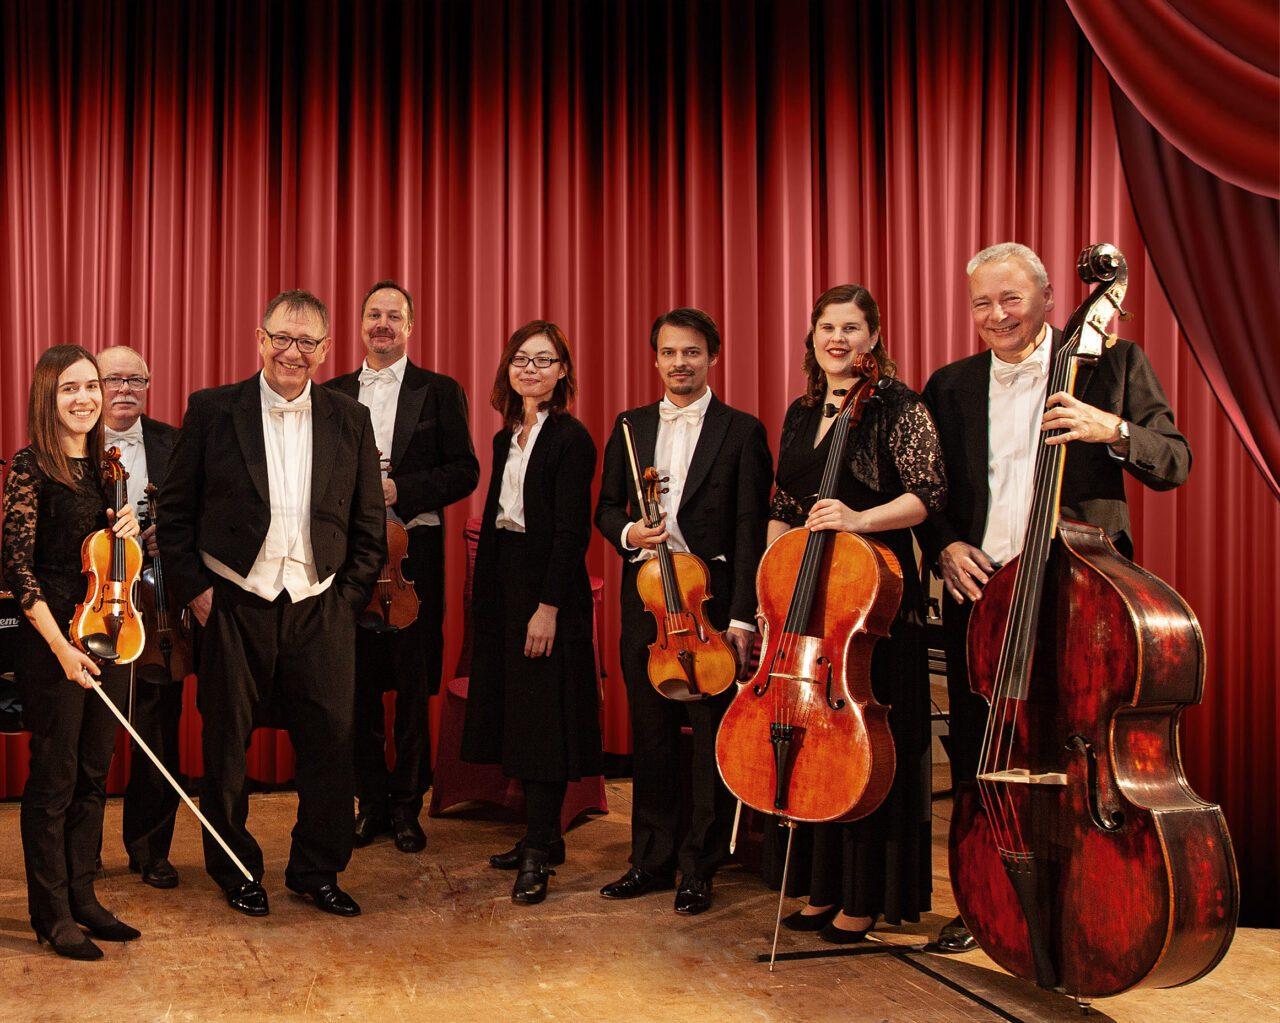 BKE Salonorchester 1 Fotograf Ulrich Blume e1602497274988